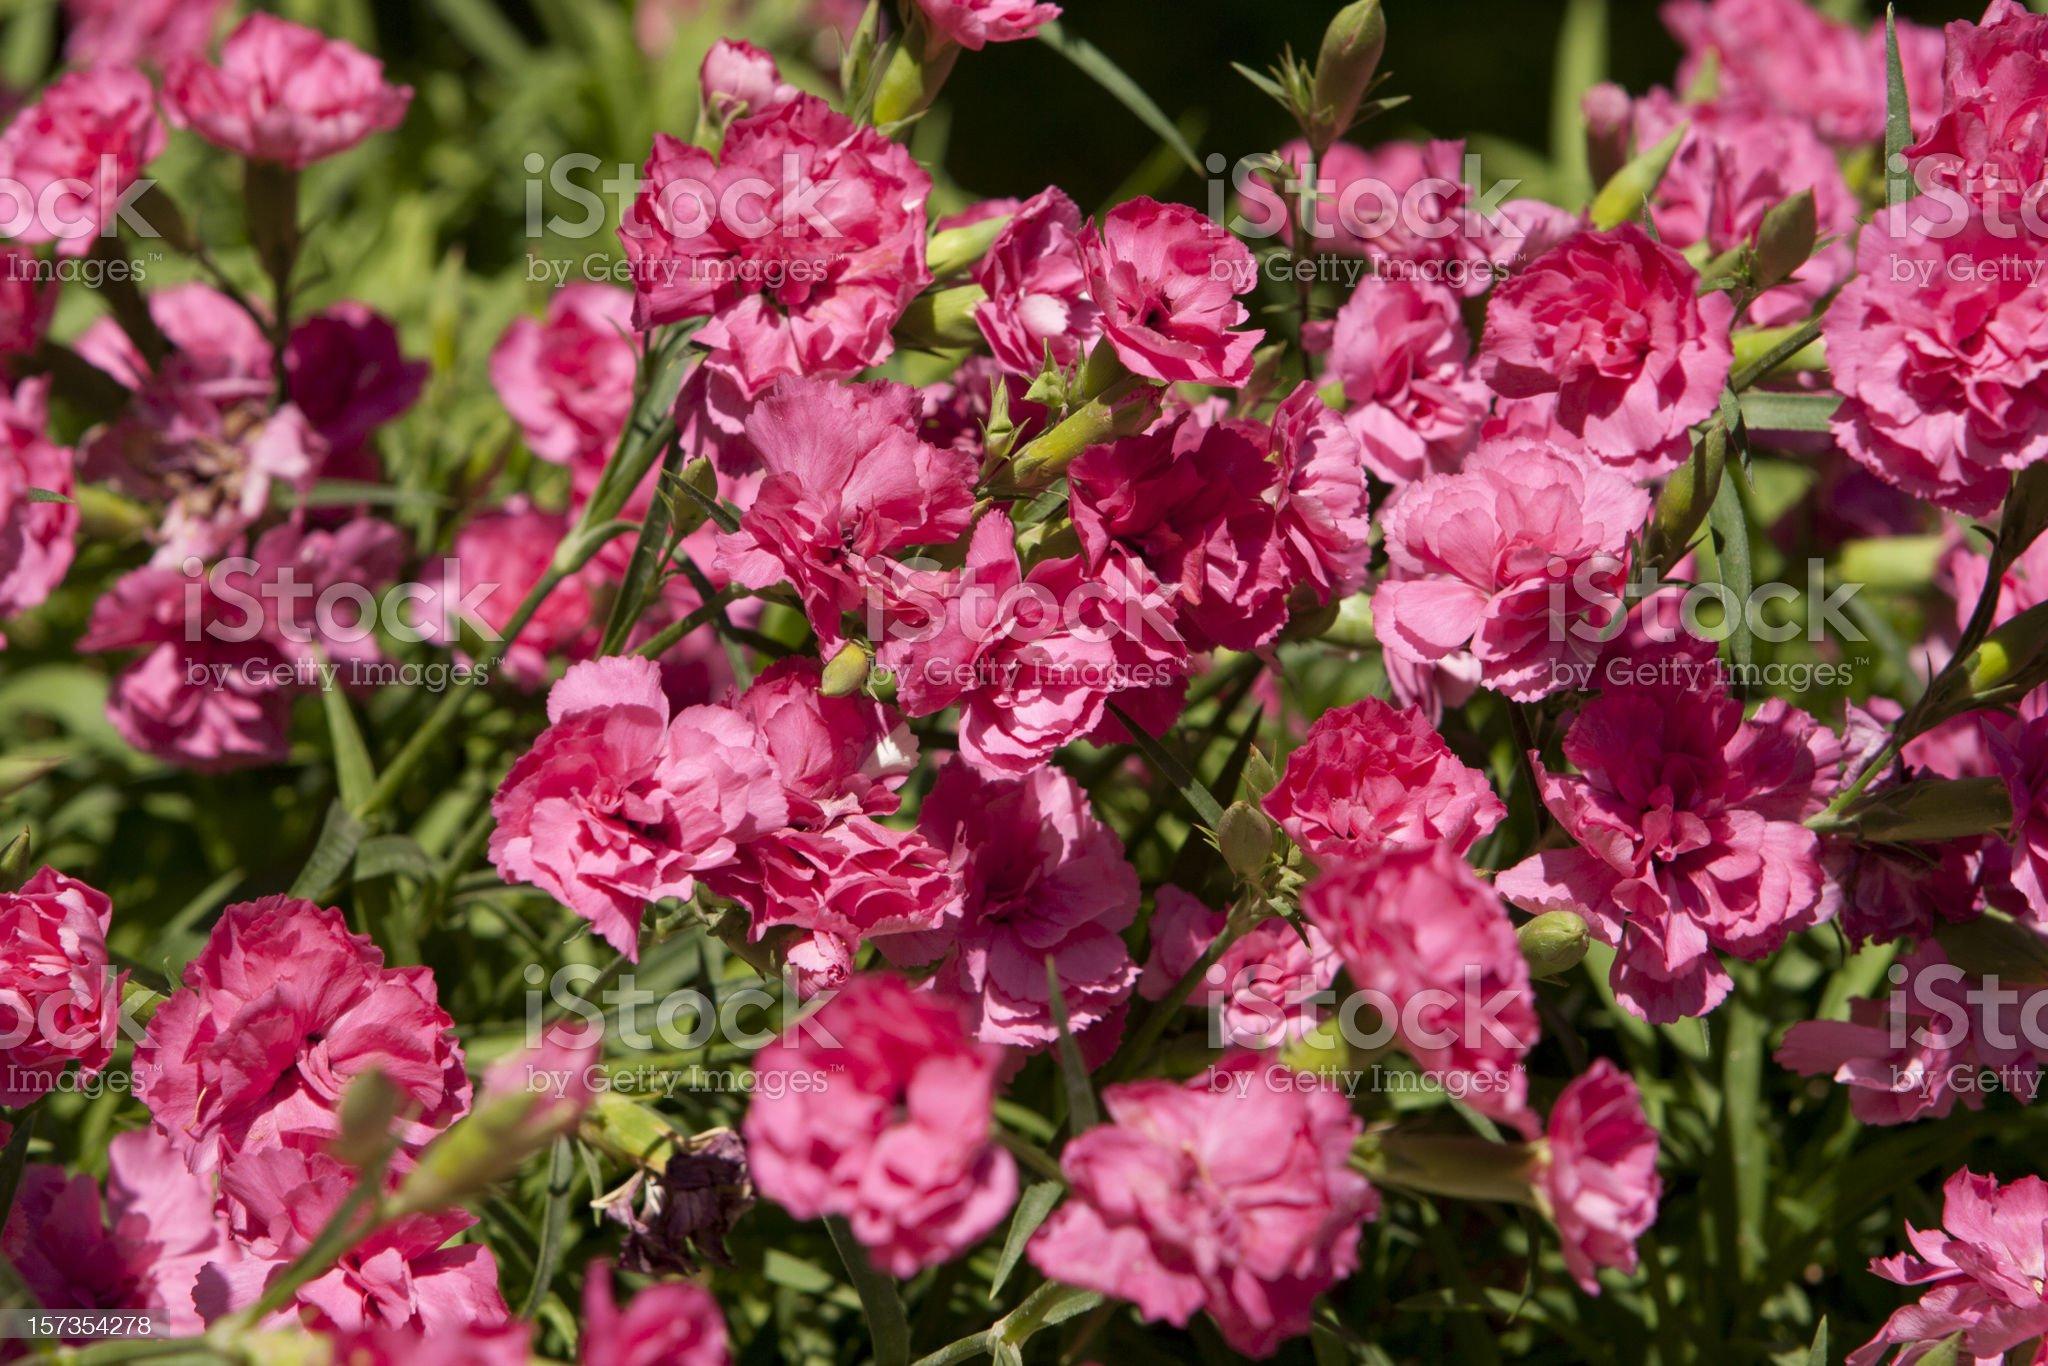 Pink carnation background. royalty-free stock photo